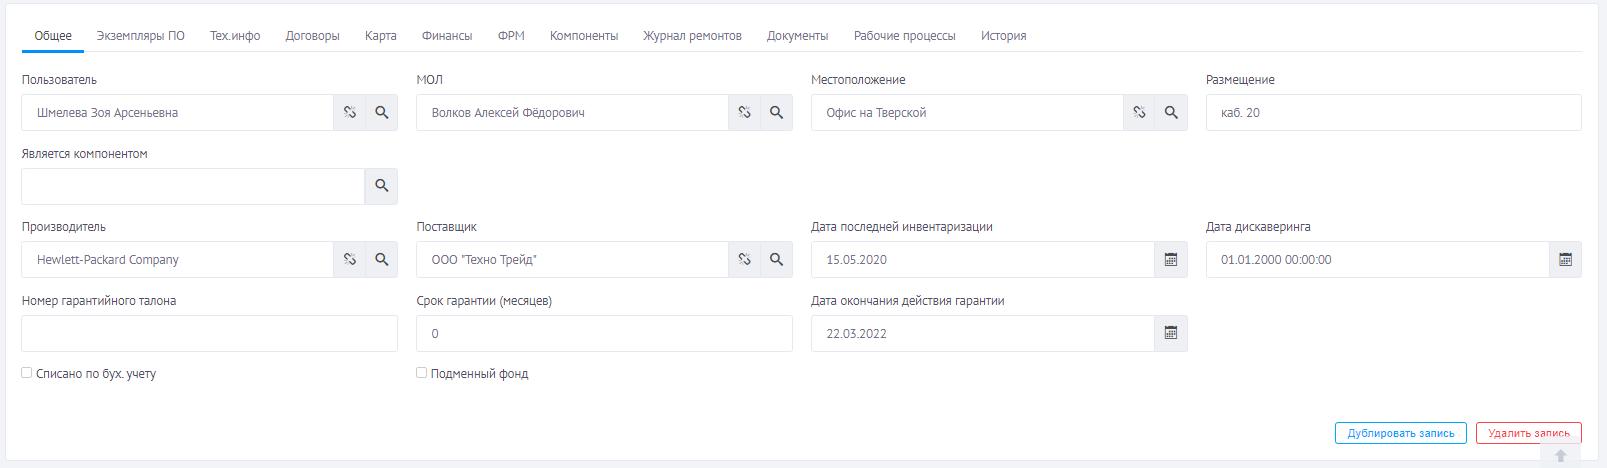 Общий вид интерфейса системы A-Tracker - вкладки